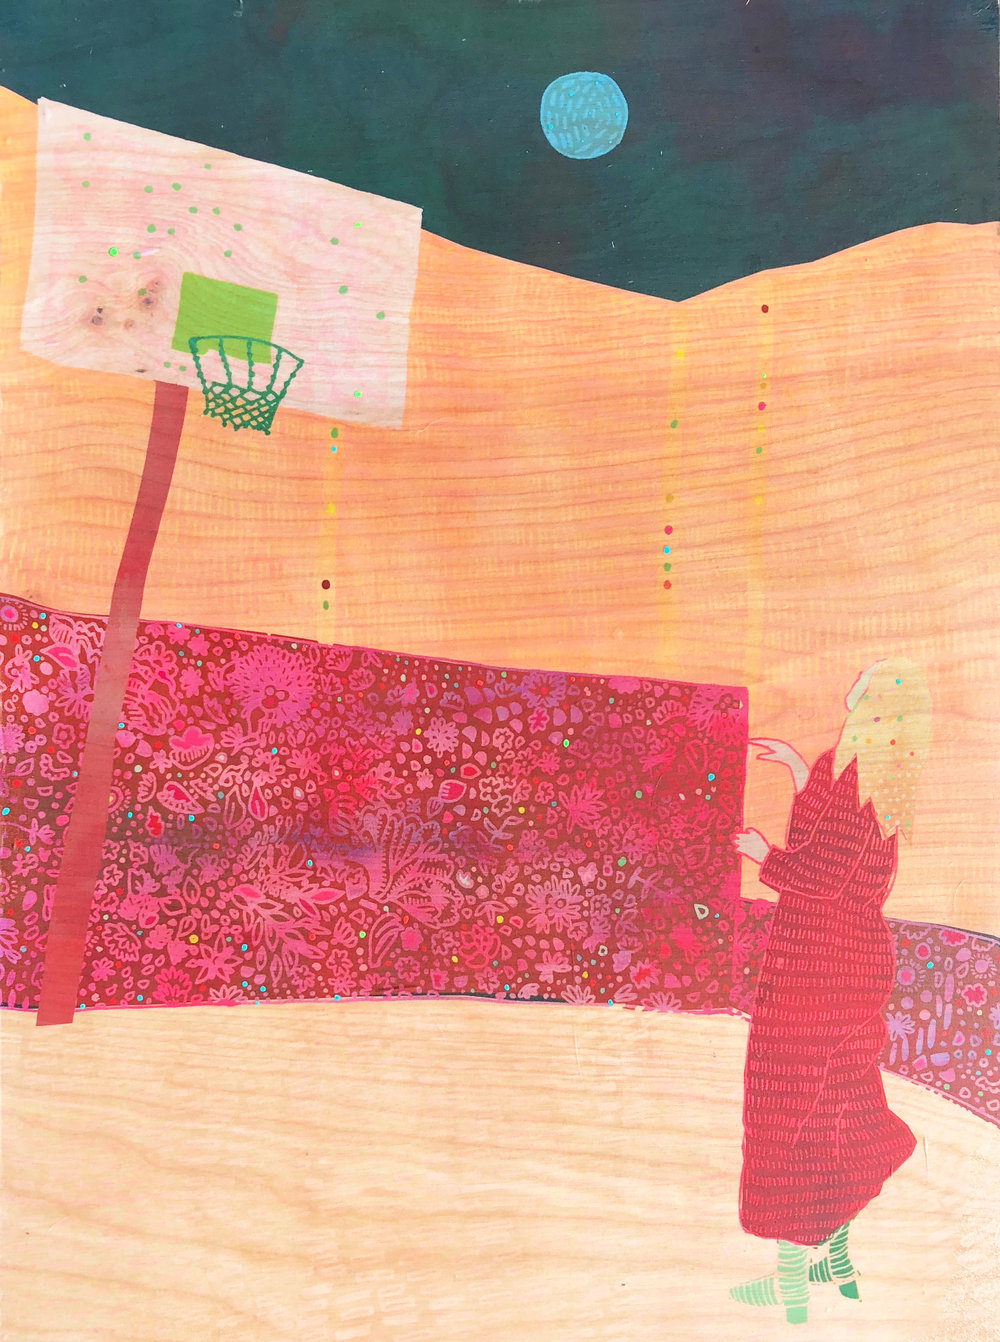 Emma Repp__Baller__18 x 24_Chiffon, Birch, Acrylic_$470.jpg